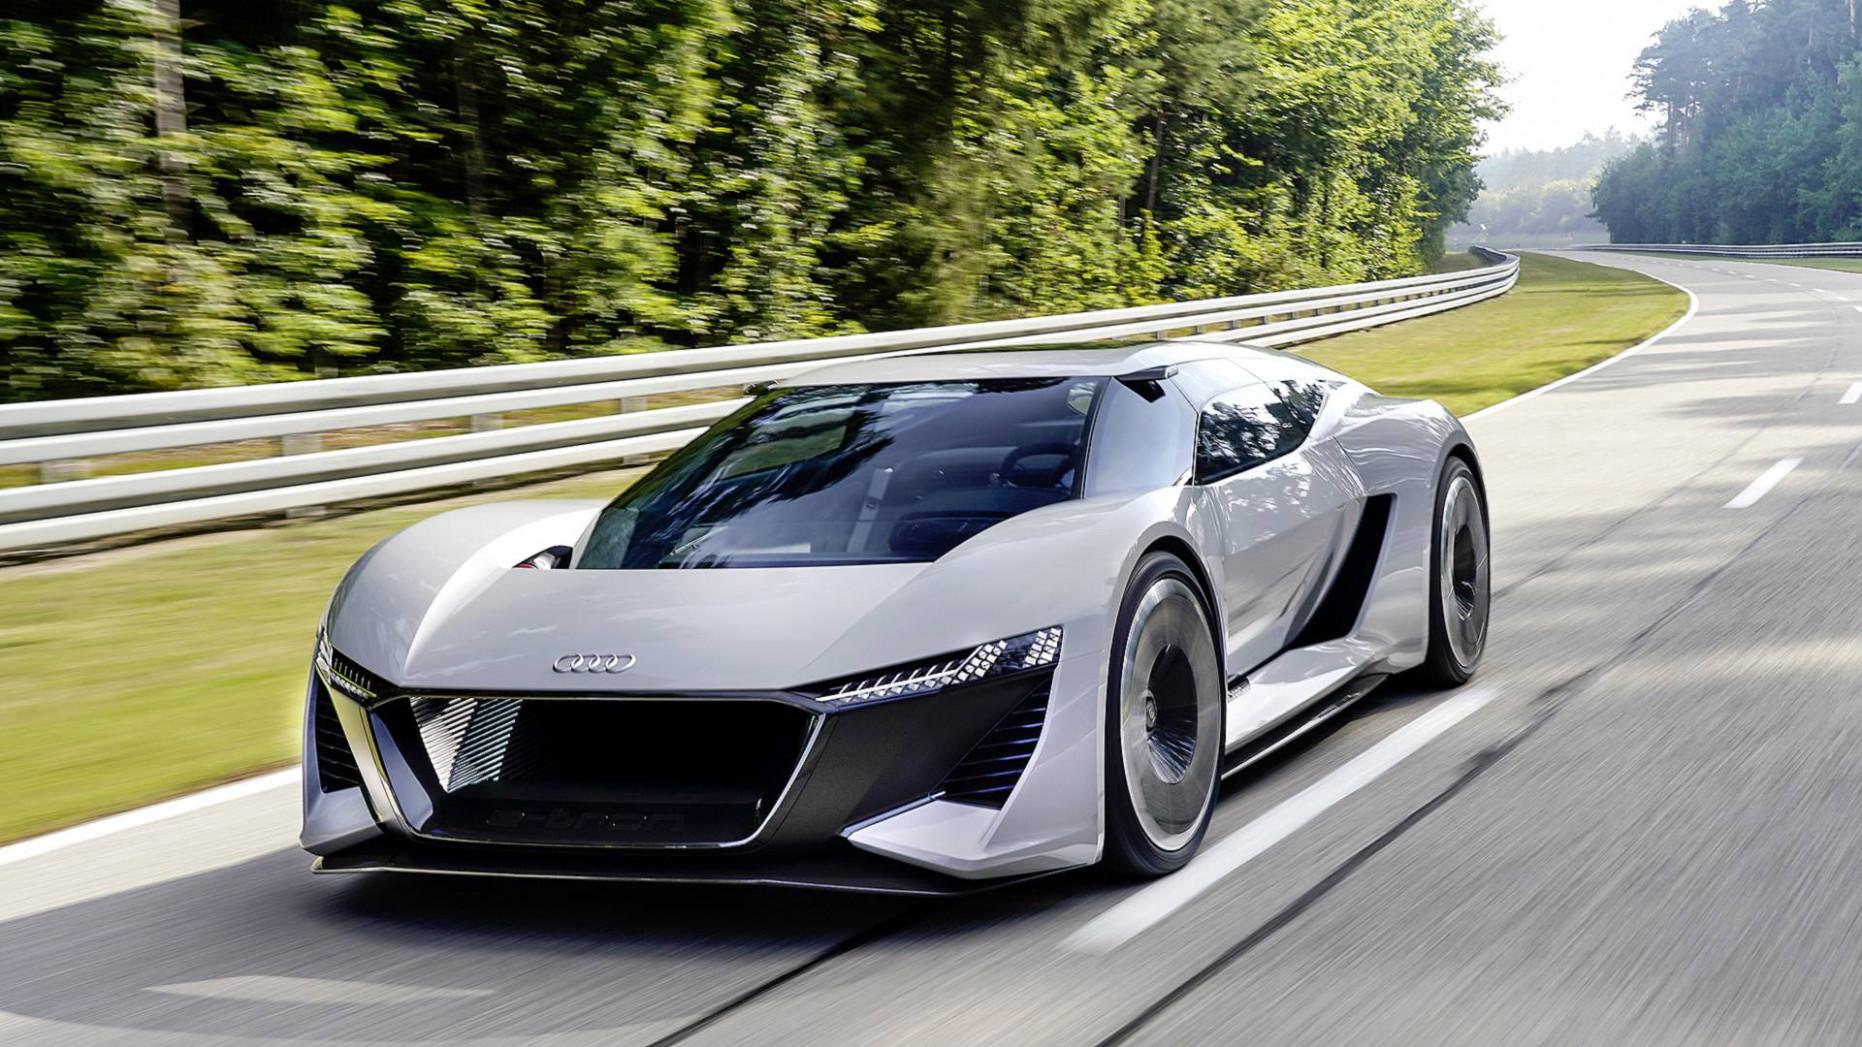 Concept Audi R8 2022 Black